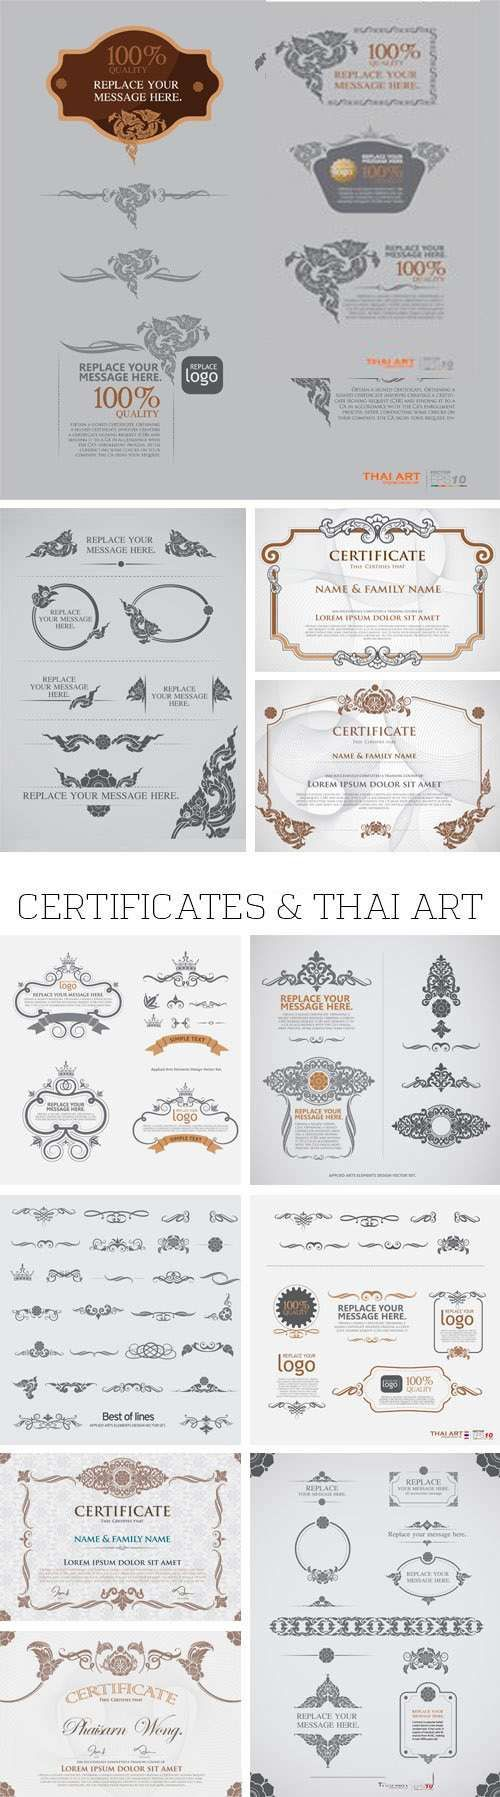 Stock Vector - Certificates & Thai Art, 25xEPS